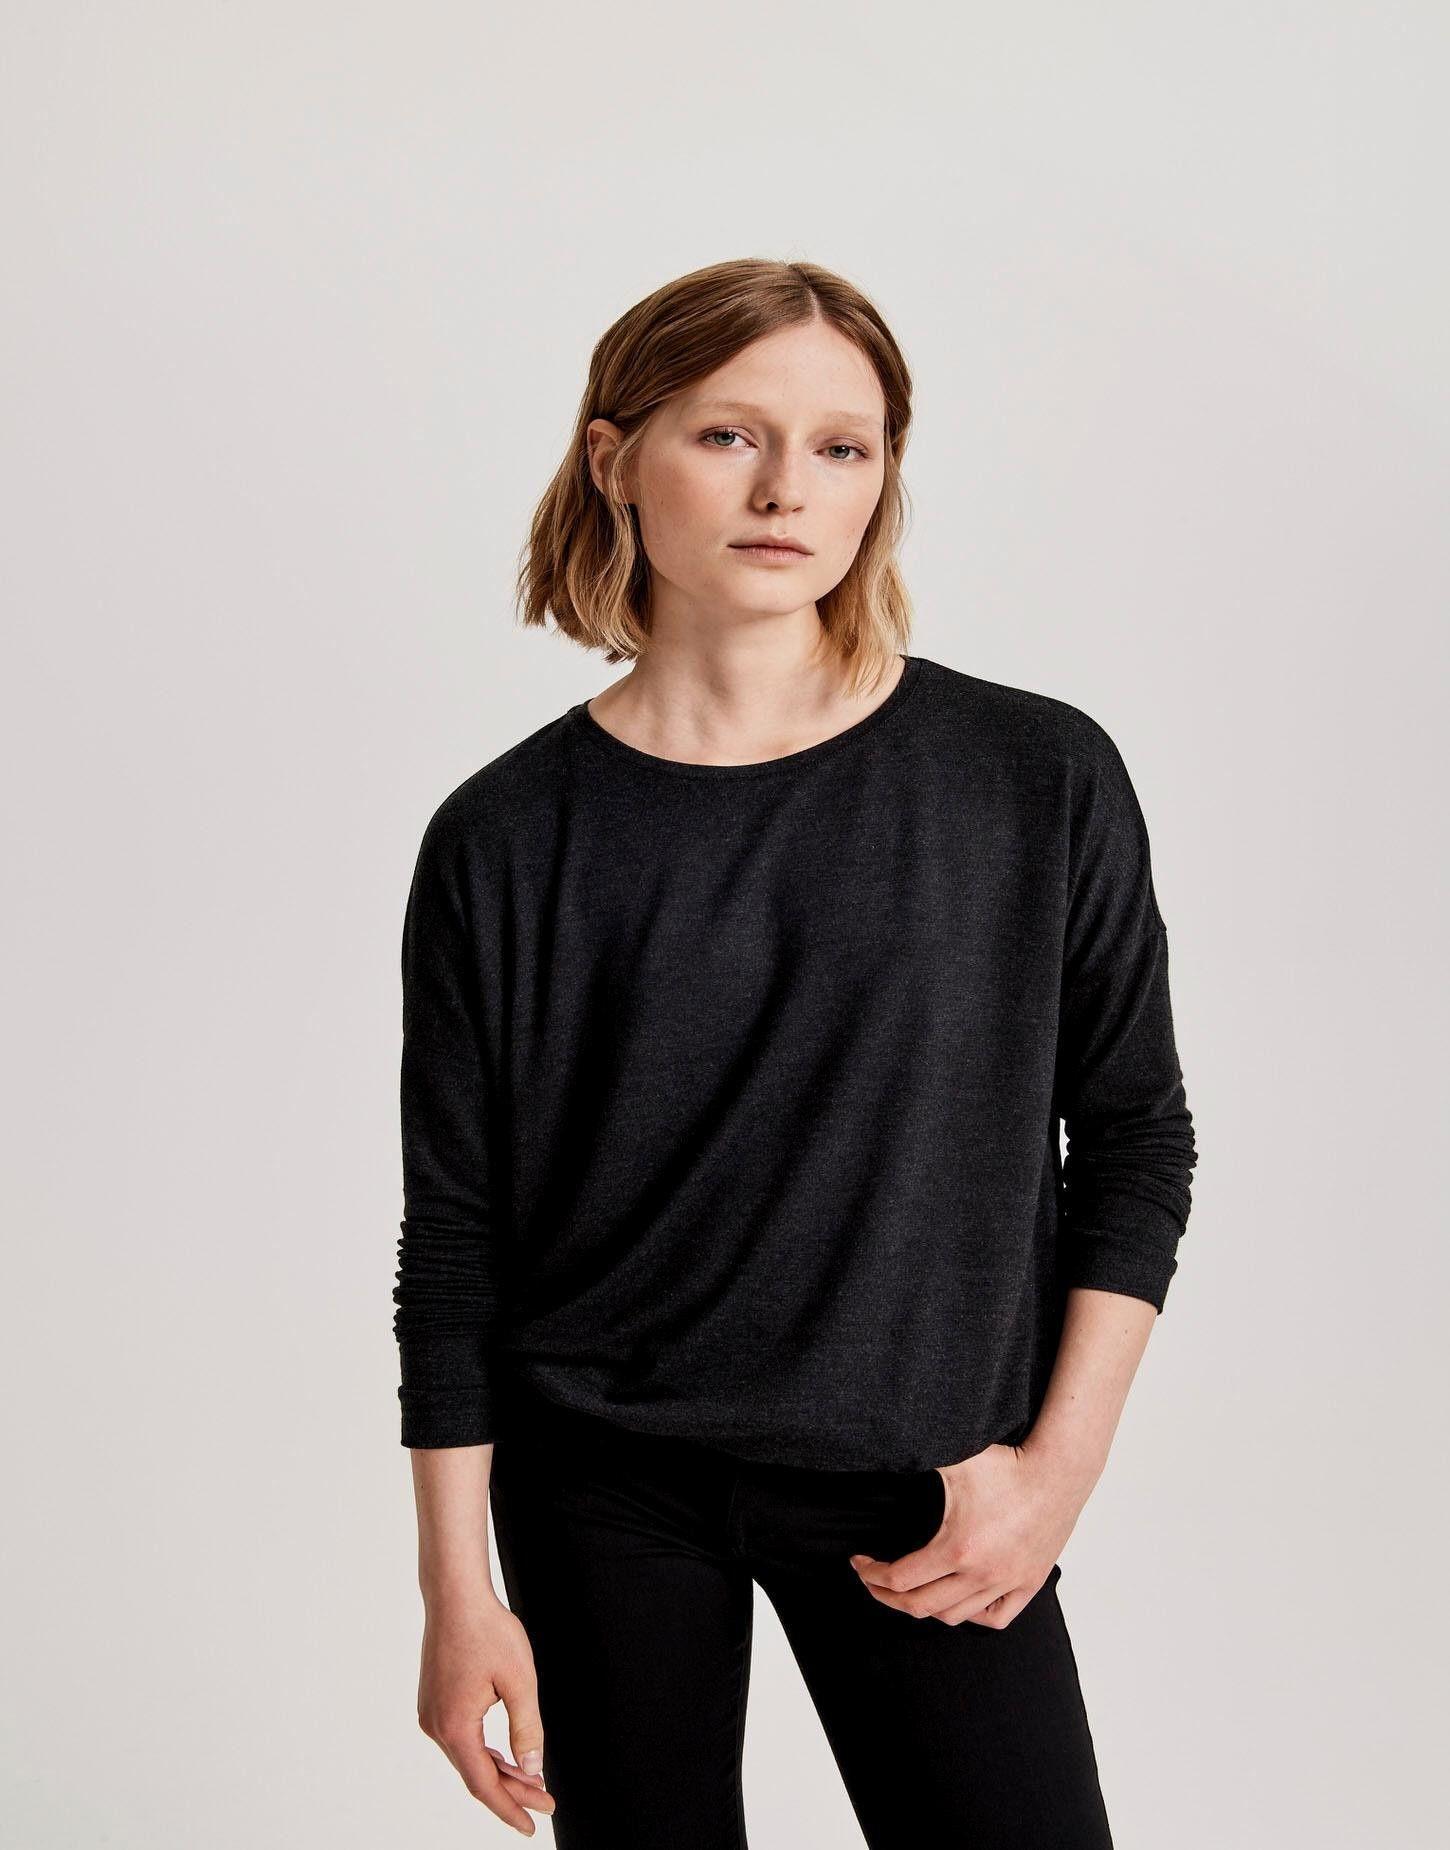 Opus Damen Sweatshirt mit Wasserfallausschnitt Sweat Langarm Longsleeve  40